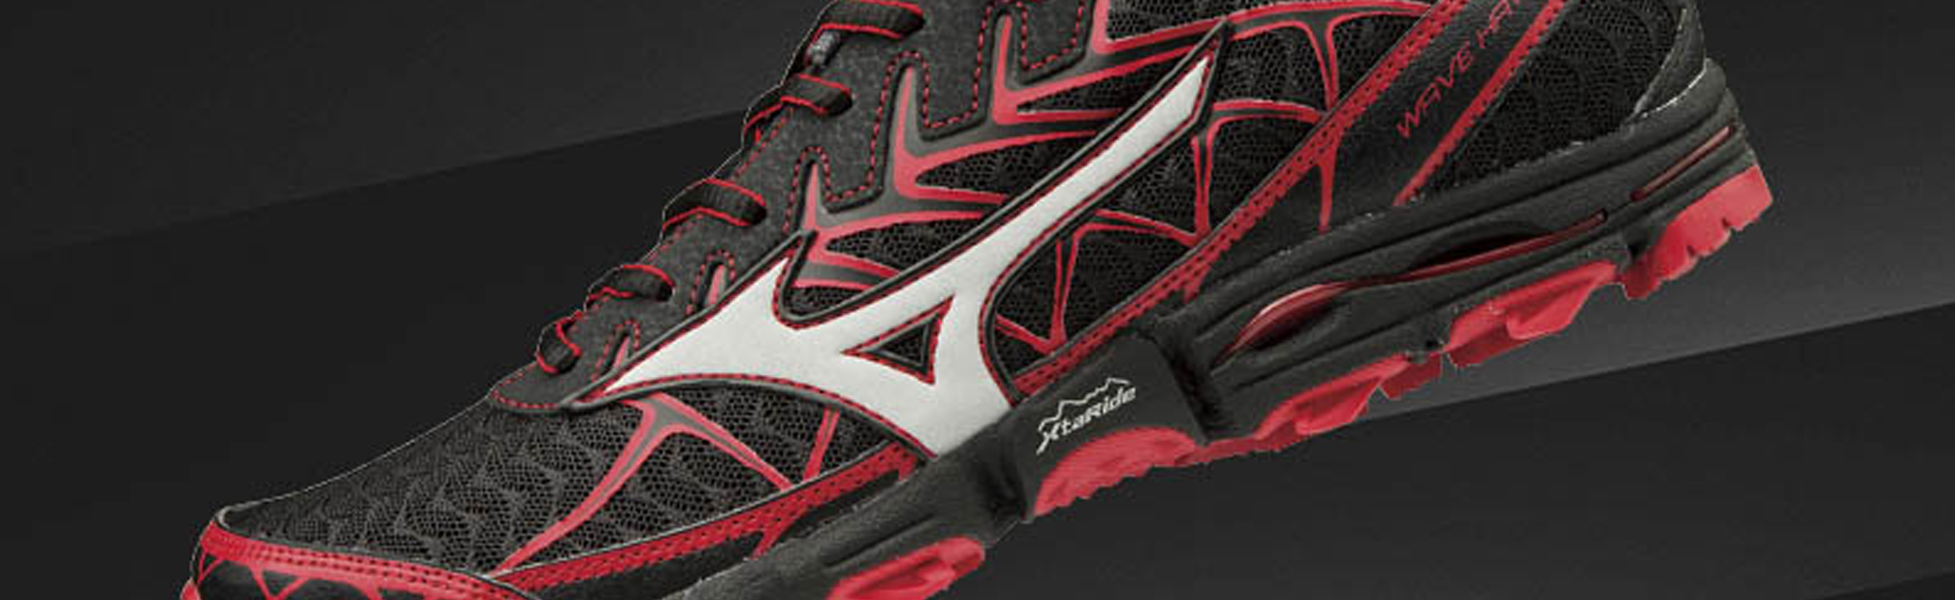 trailrunning schoenen